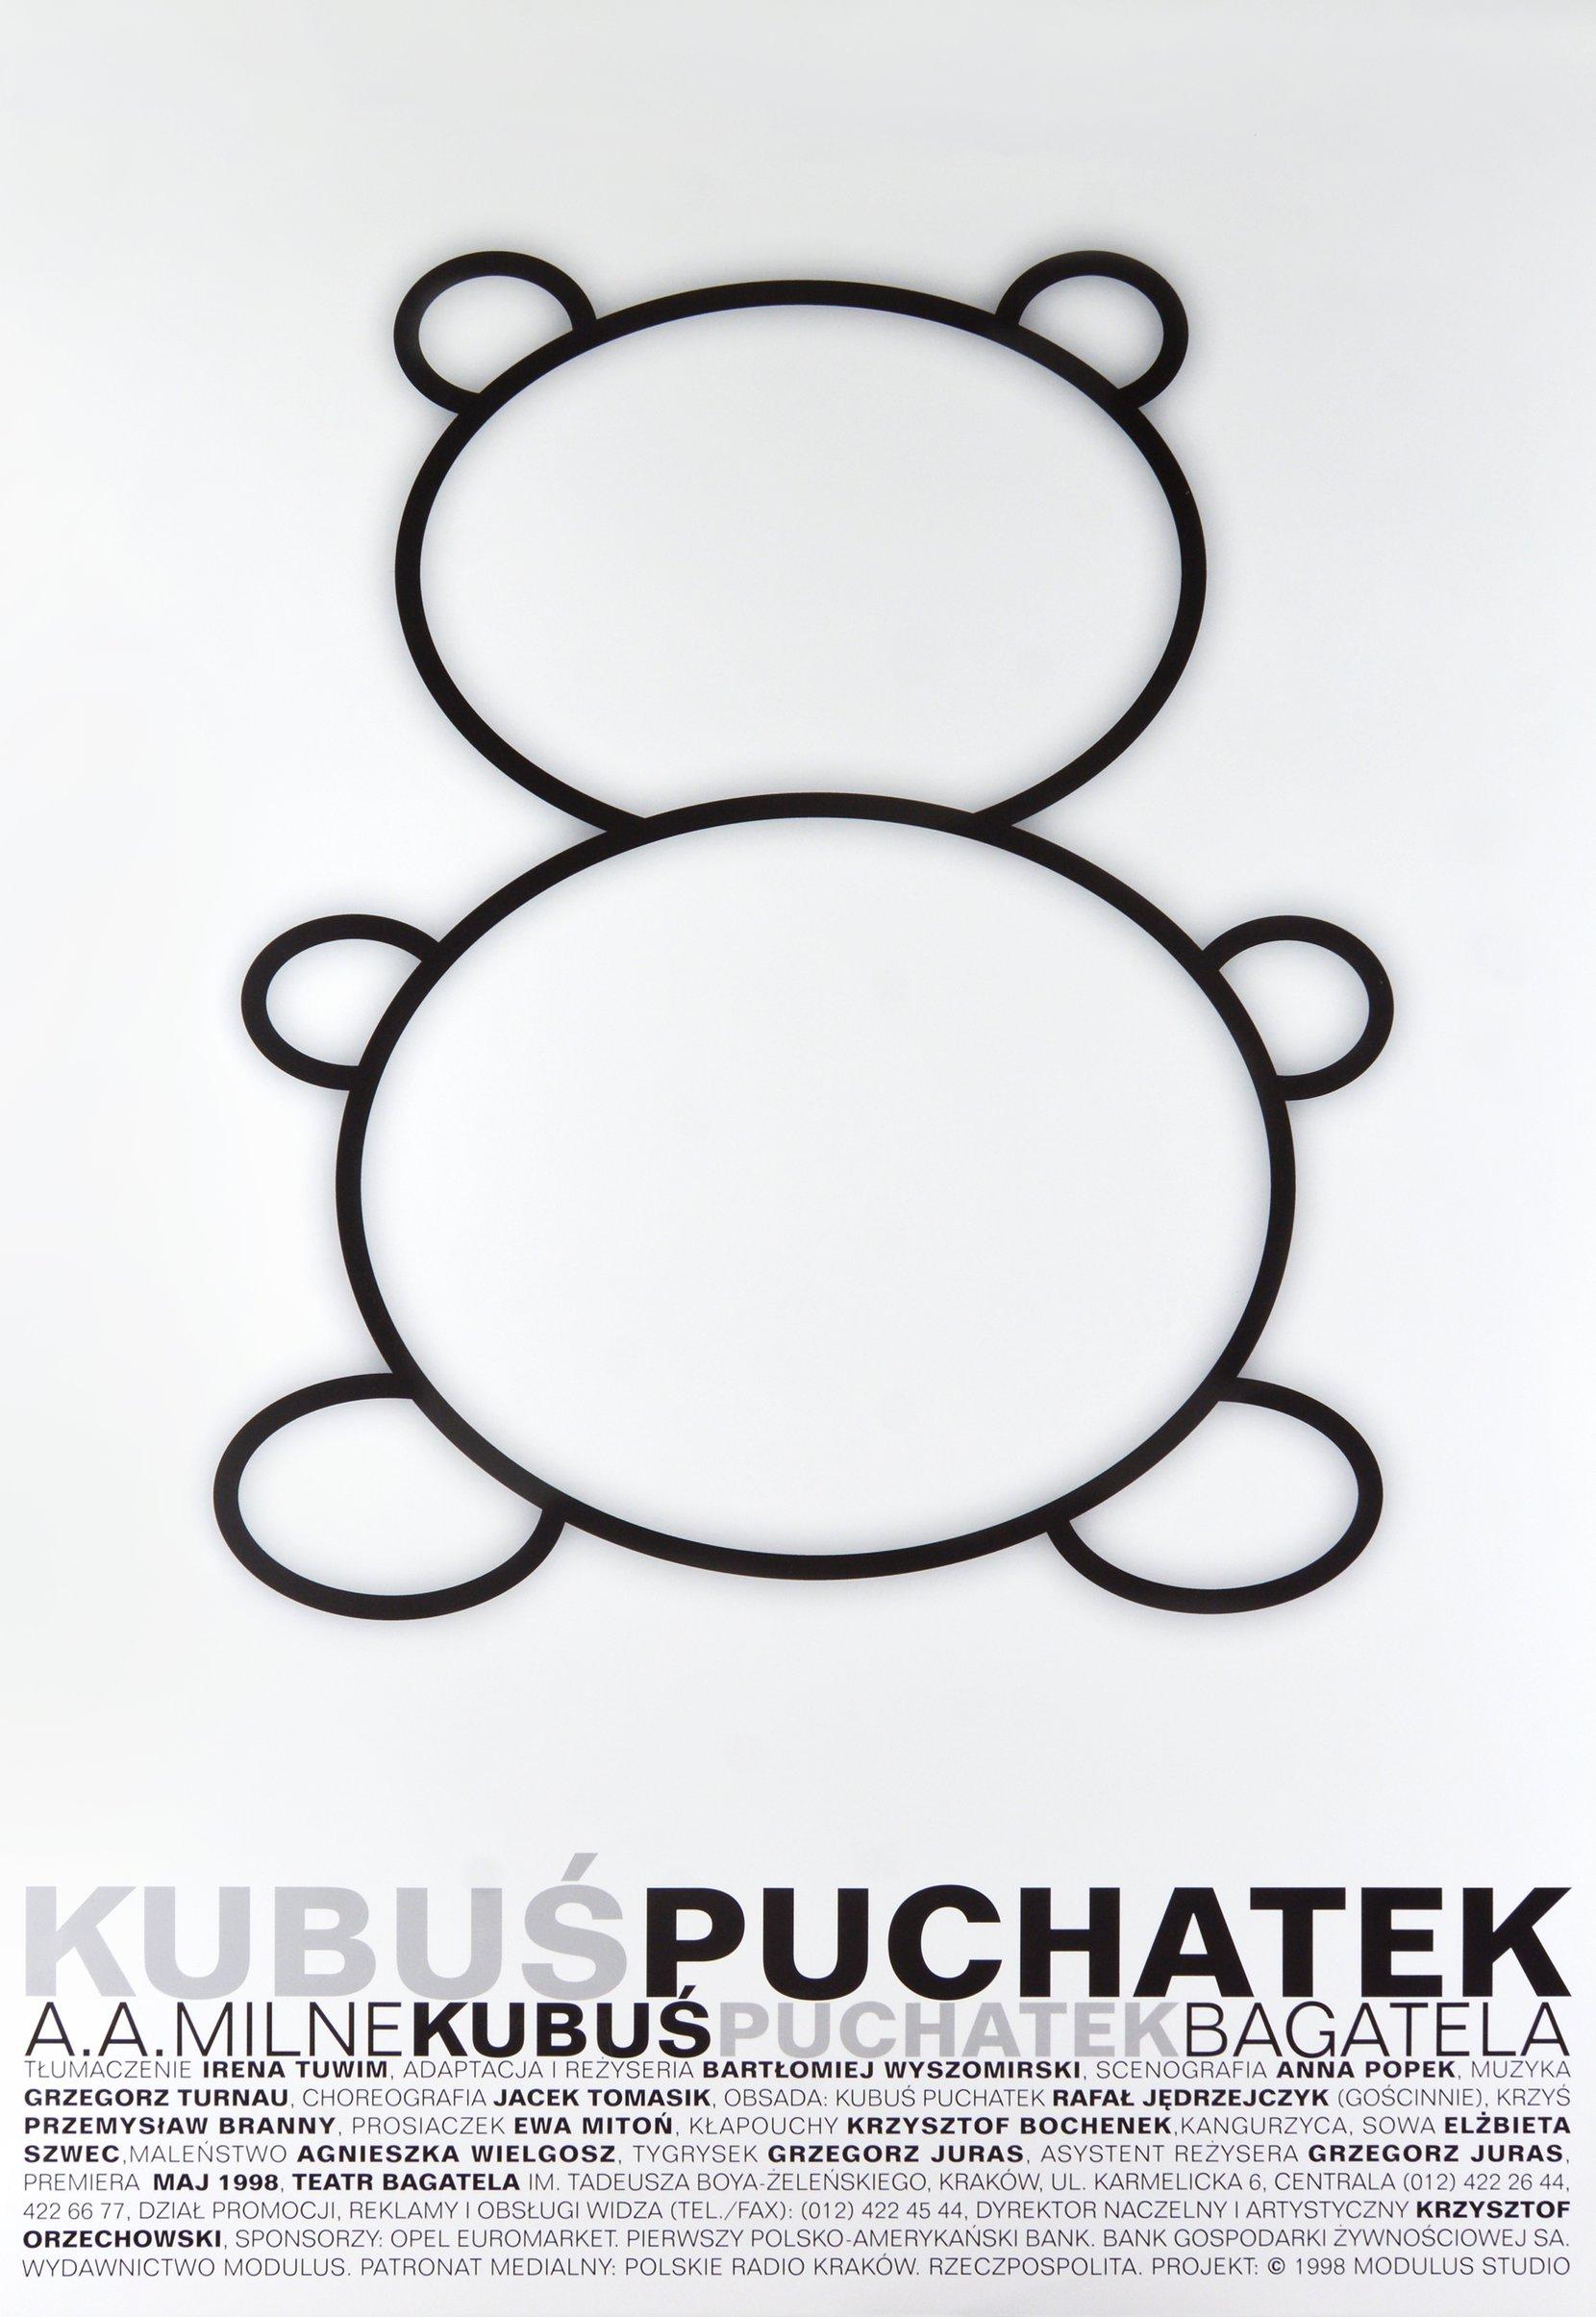 kubuś puchatek, modulus studio (1999) posters movie posters Modulus Studio